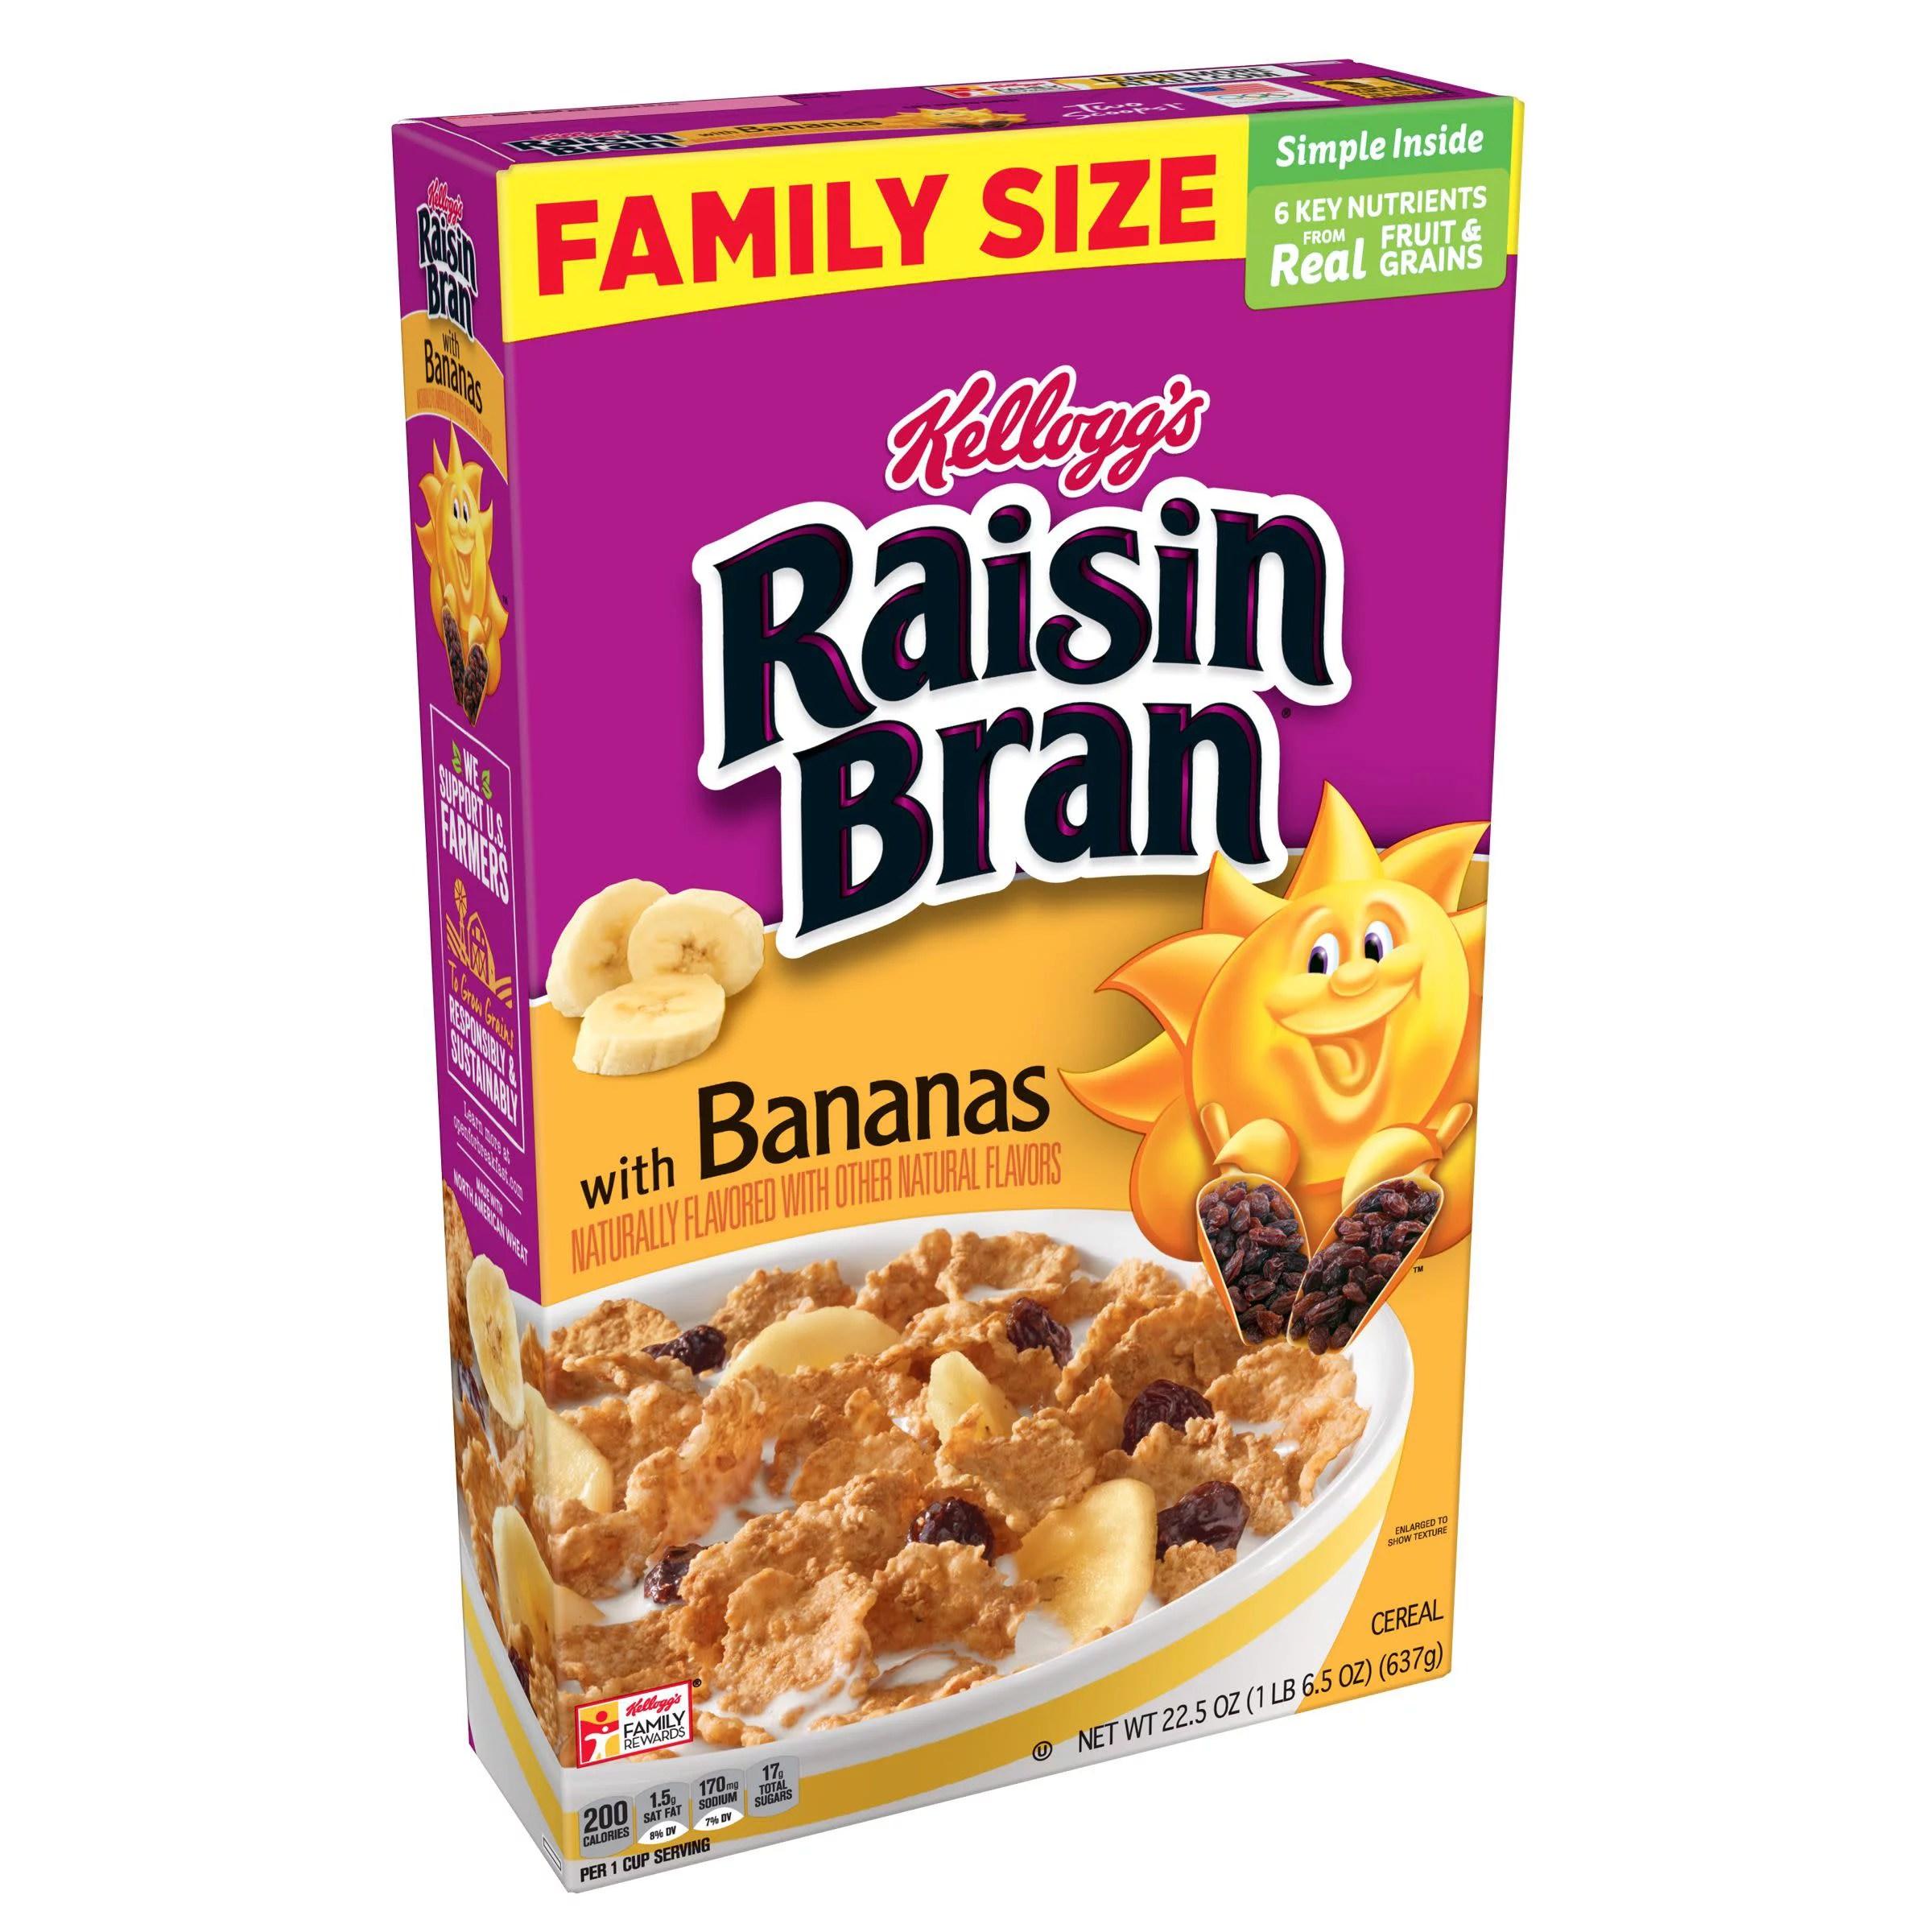 Great Value Organic Raisin Bran Cereal 18.7 oz - Walmart.com